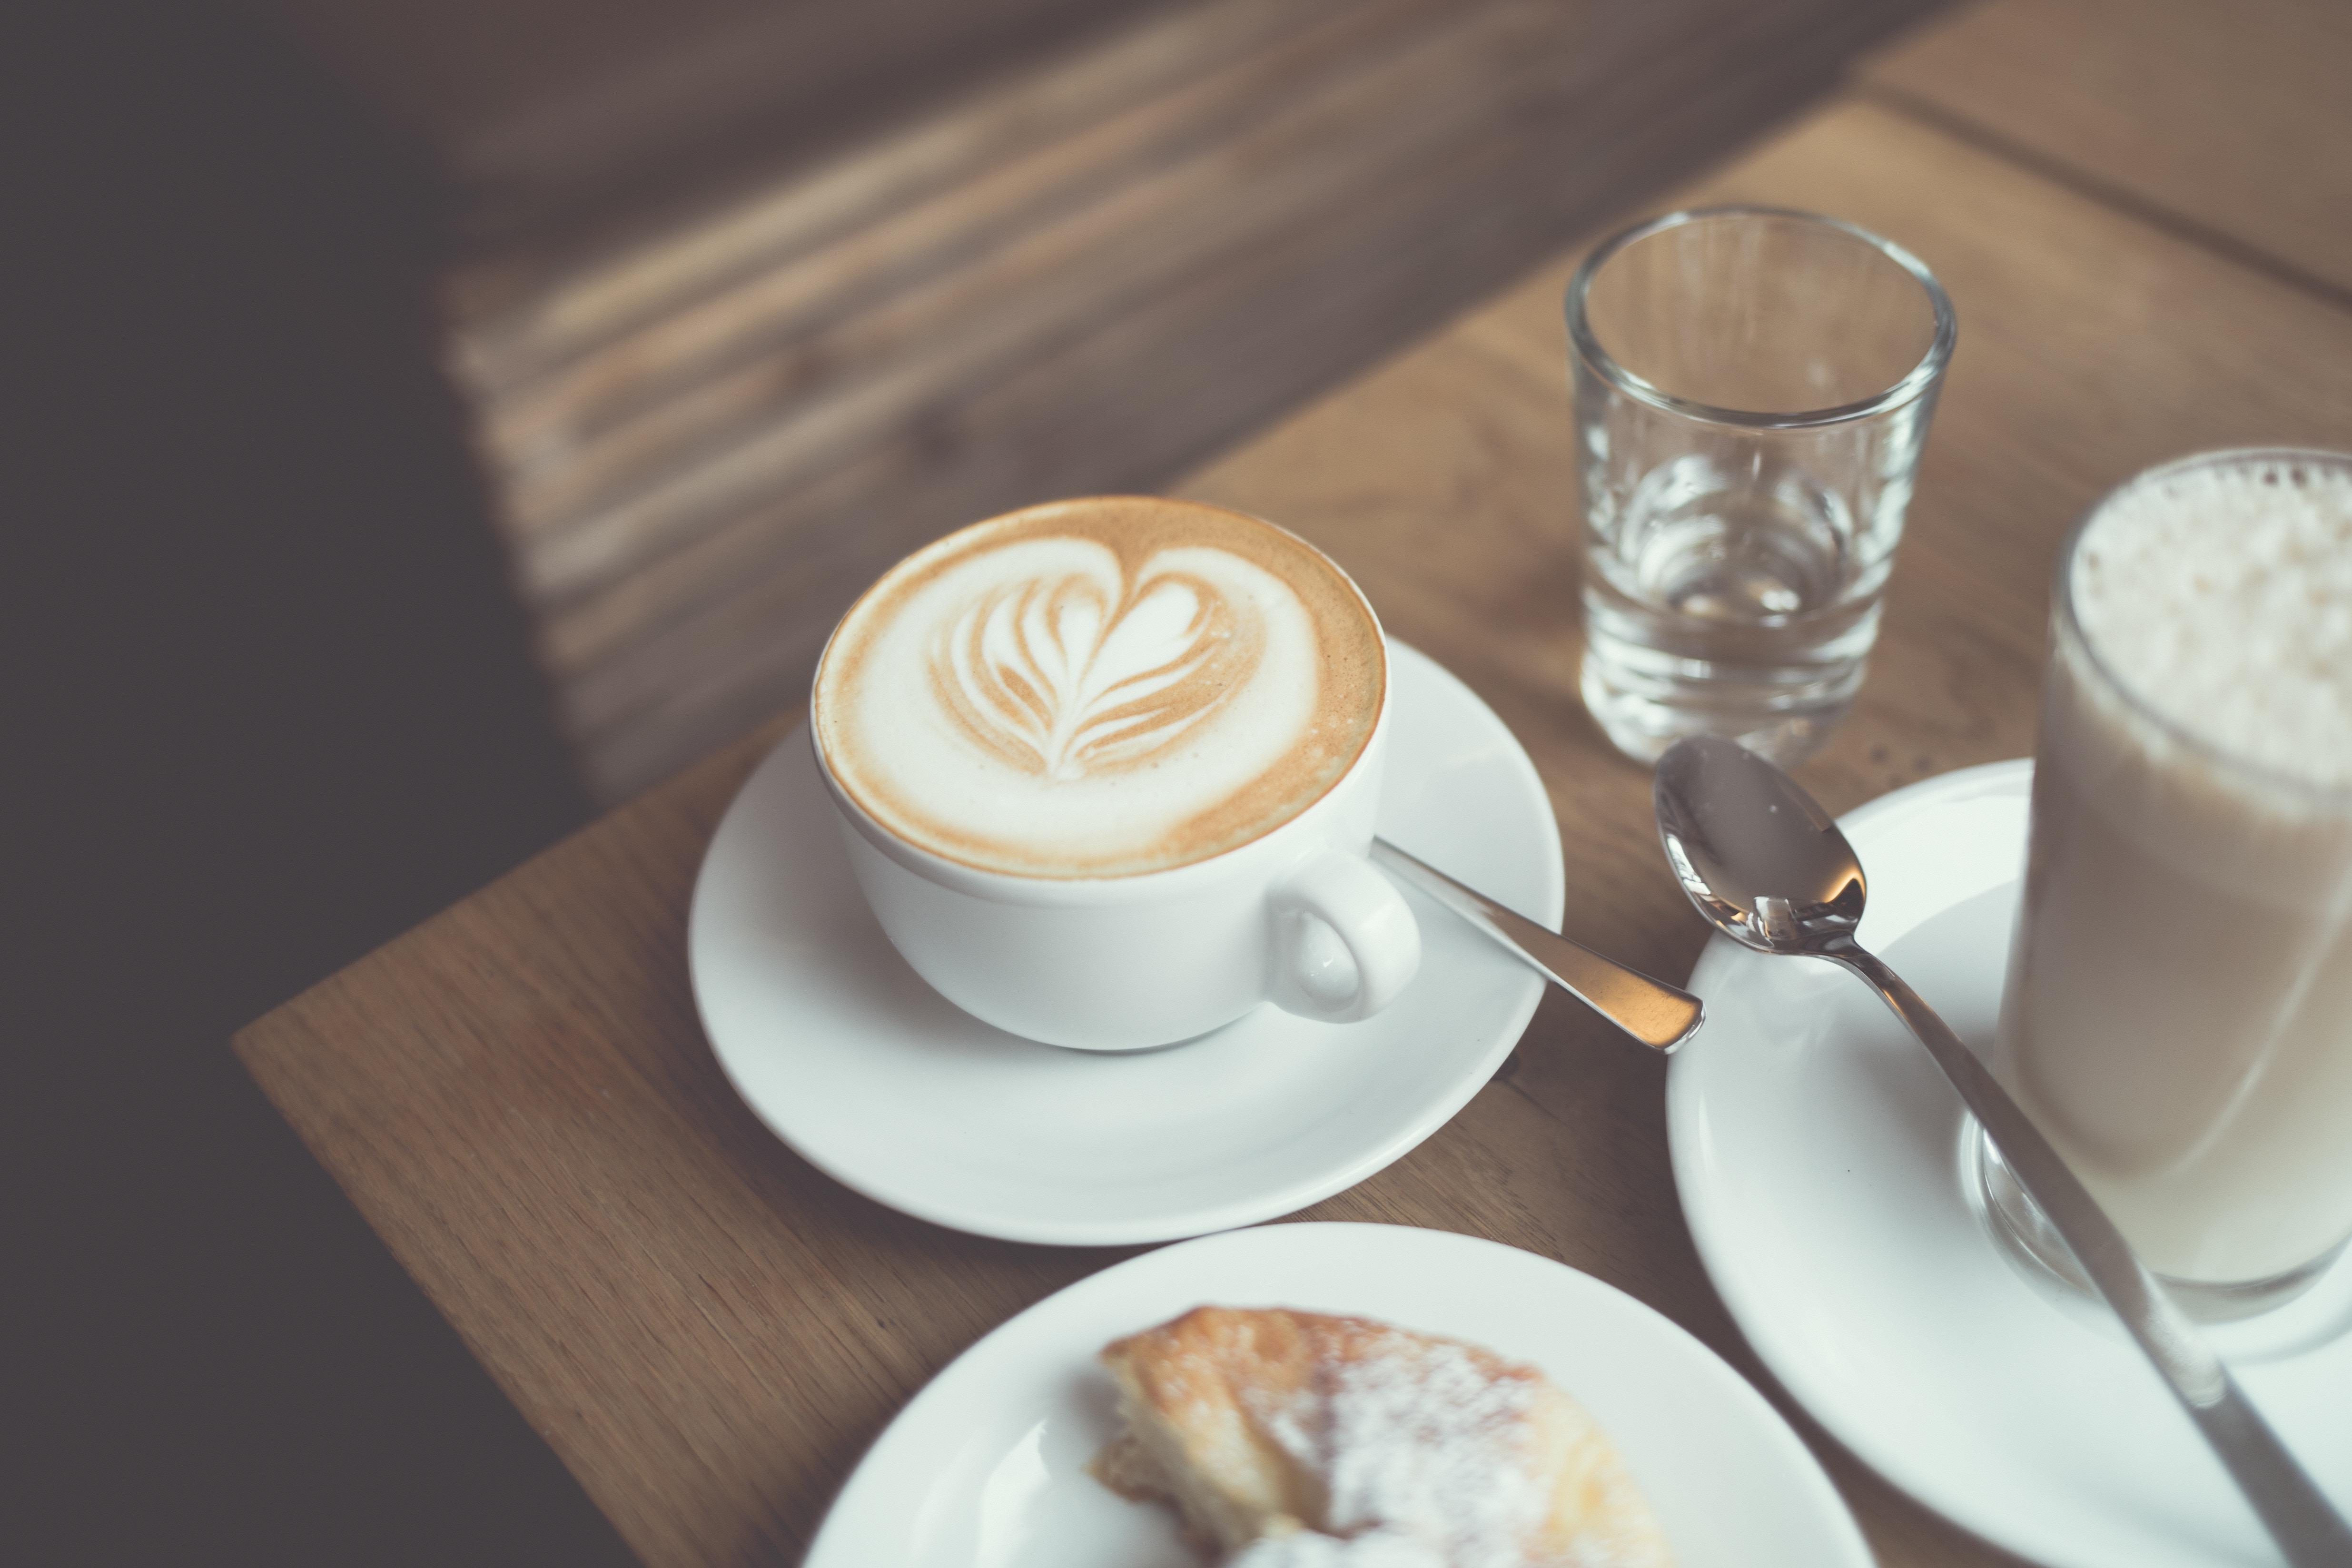 God kaffe og lækre kager: Her åbner ny kaffebar i to etager midt i Aalborg